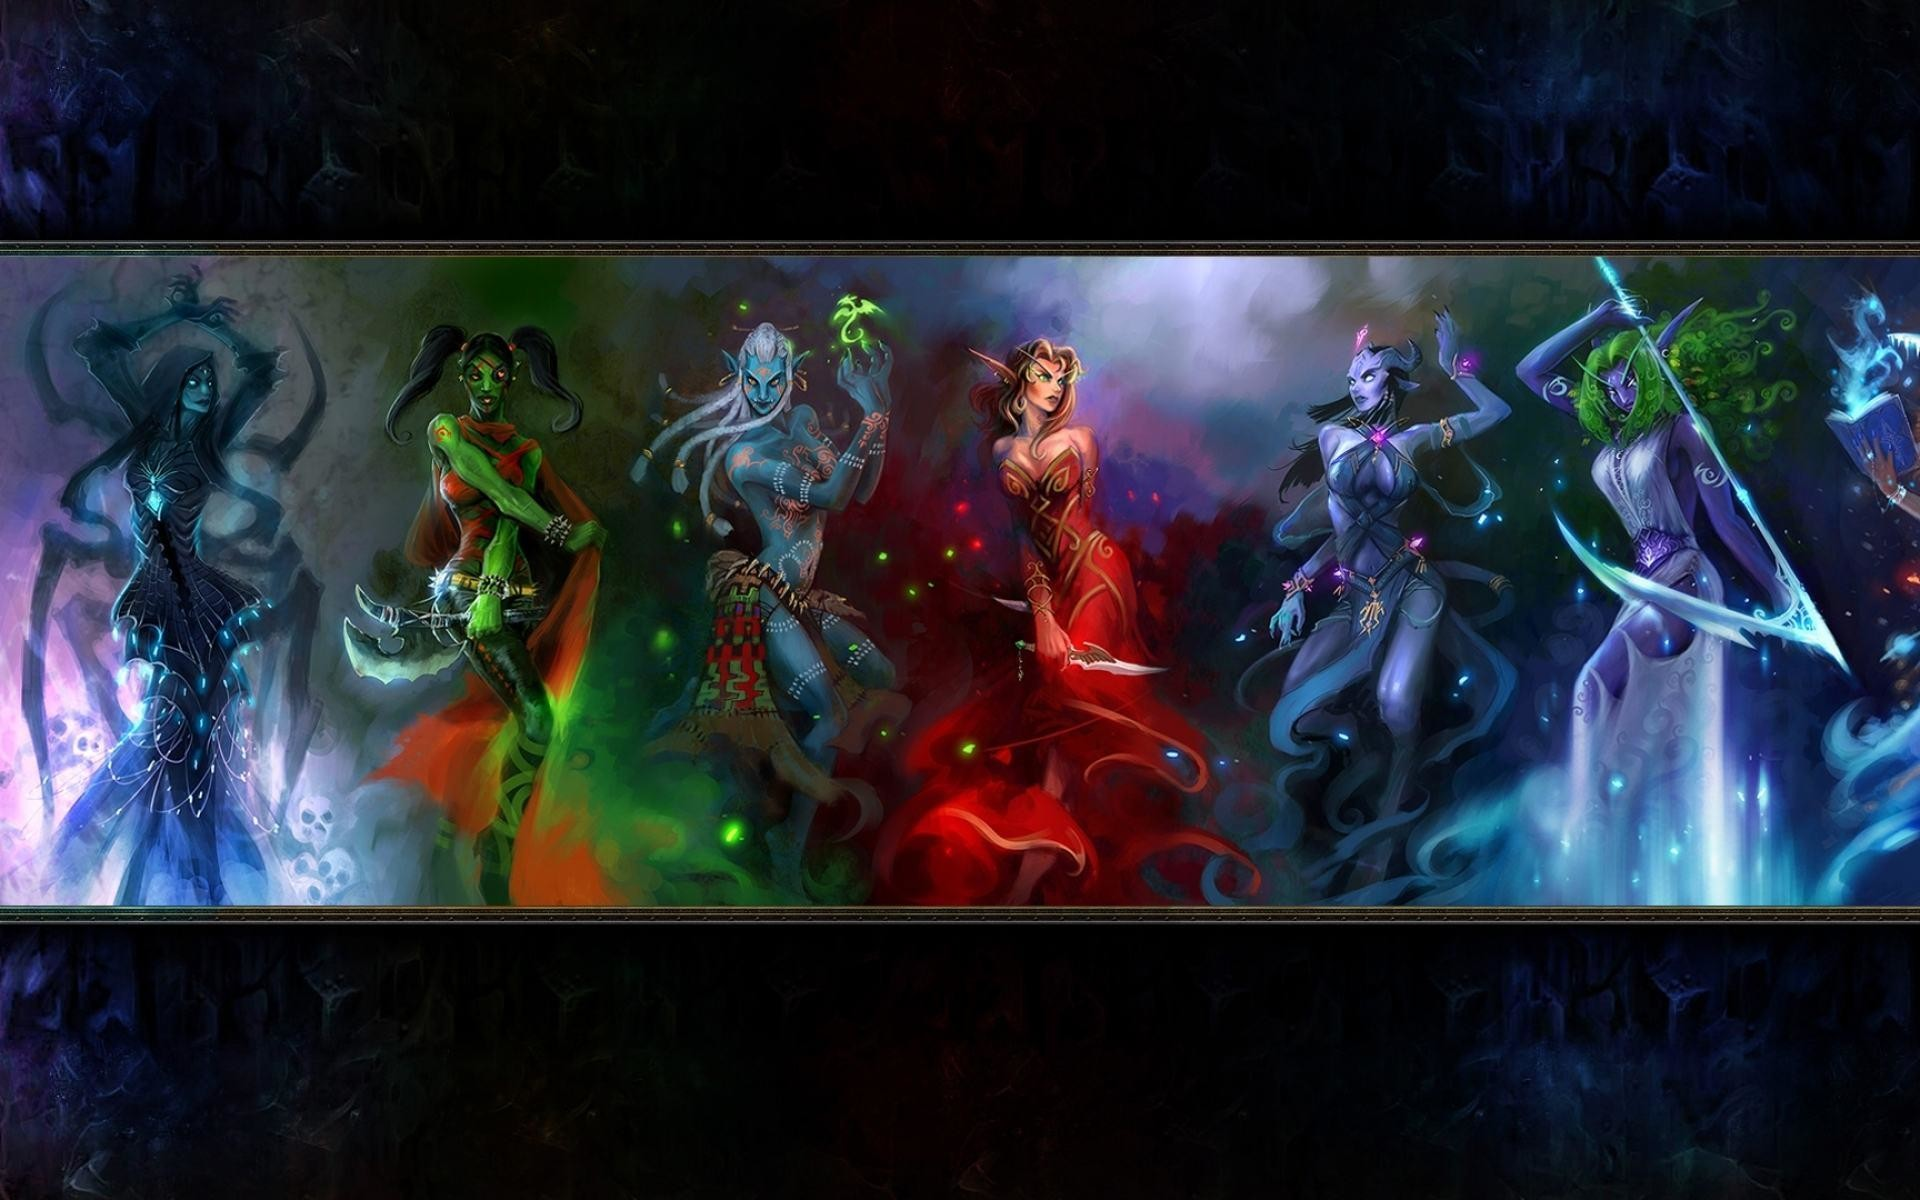 Undead Wallpaper Wow – WallpaperSafari